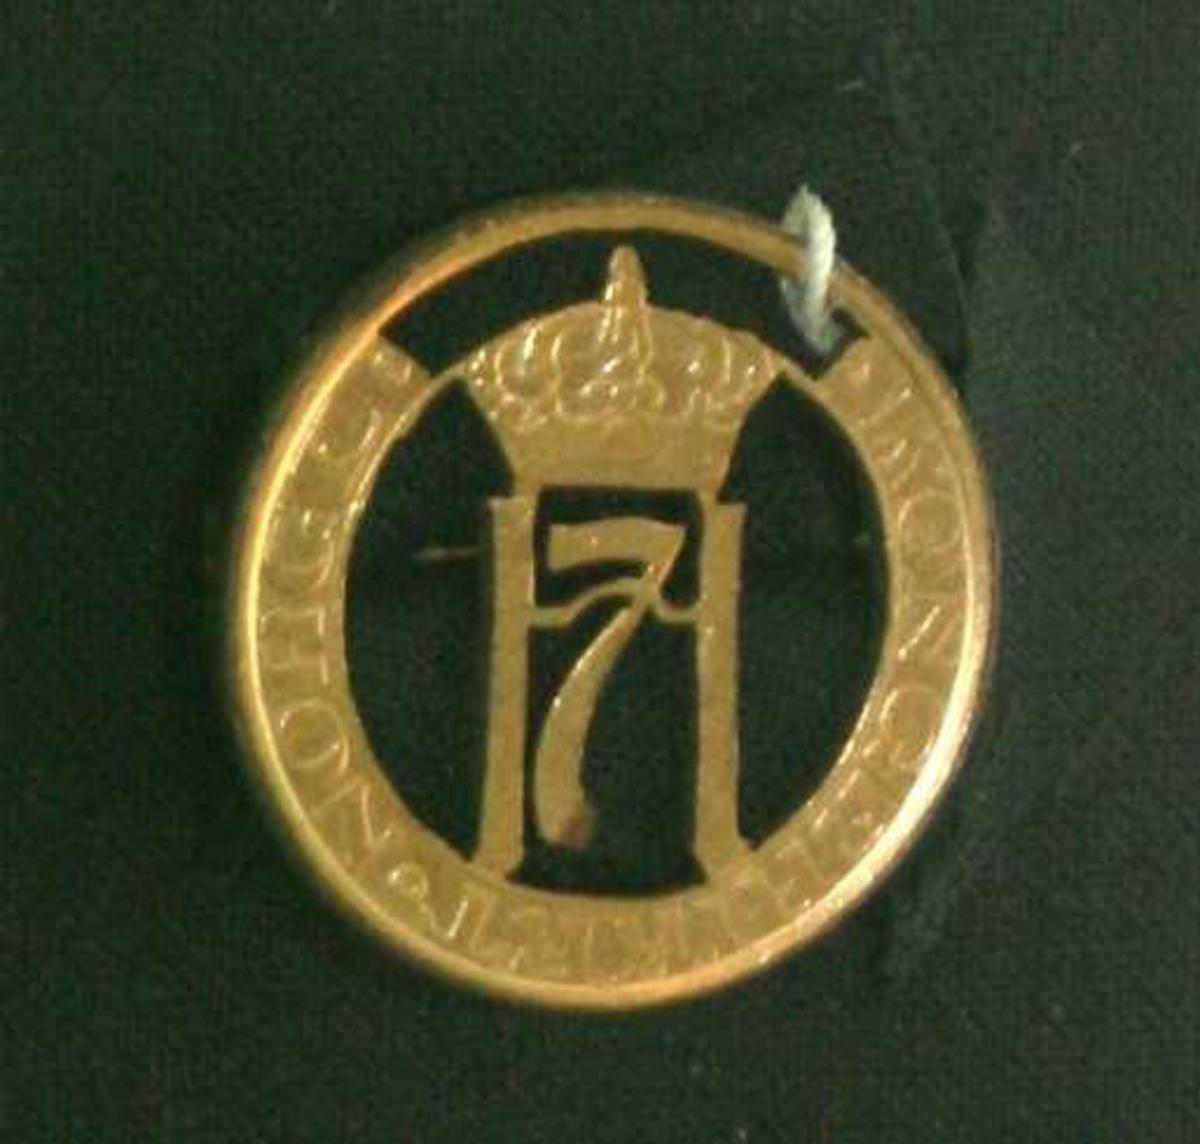 Kongens monogram H7